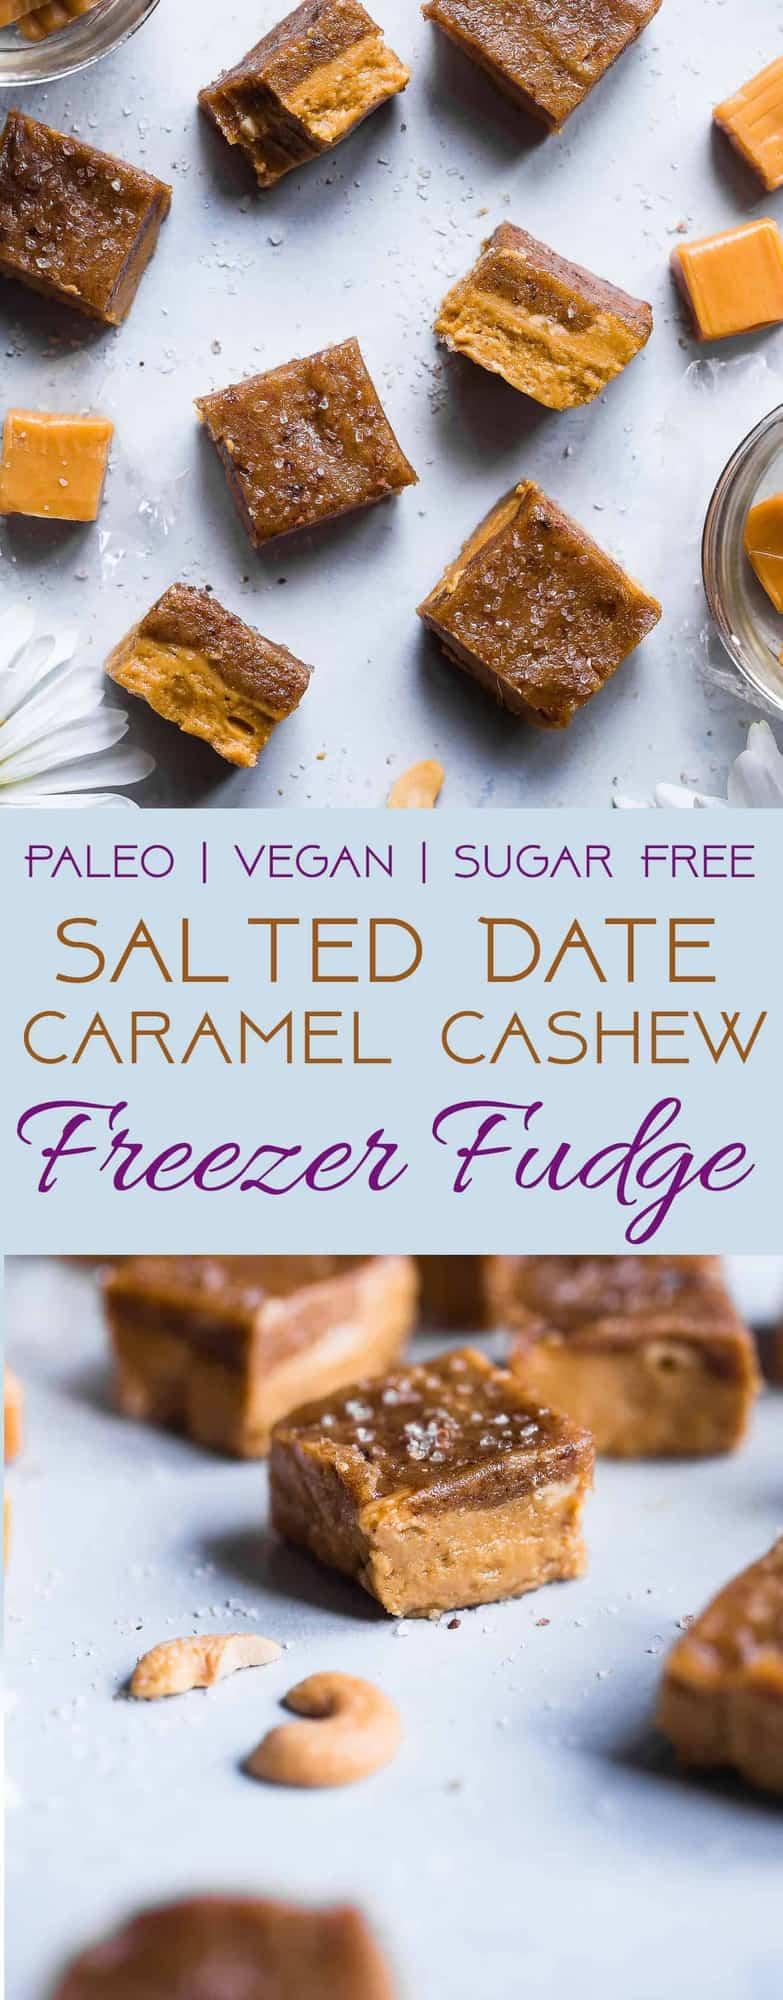 Salted Date Caramel Cashew Freezer Fudge -This easy, CREAMY, sugar free vegan fudge is topped with a salted date caramel and made in the freezer! No candy thermometerneeded!Gluten free, grain free and paleo friendly too! | | #Foodfaithfitness | #Paleo #Vegan #Sugarfree #Glutenfree #Healthy